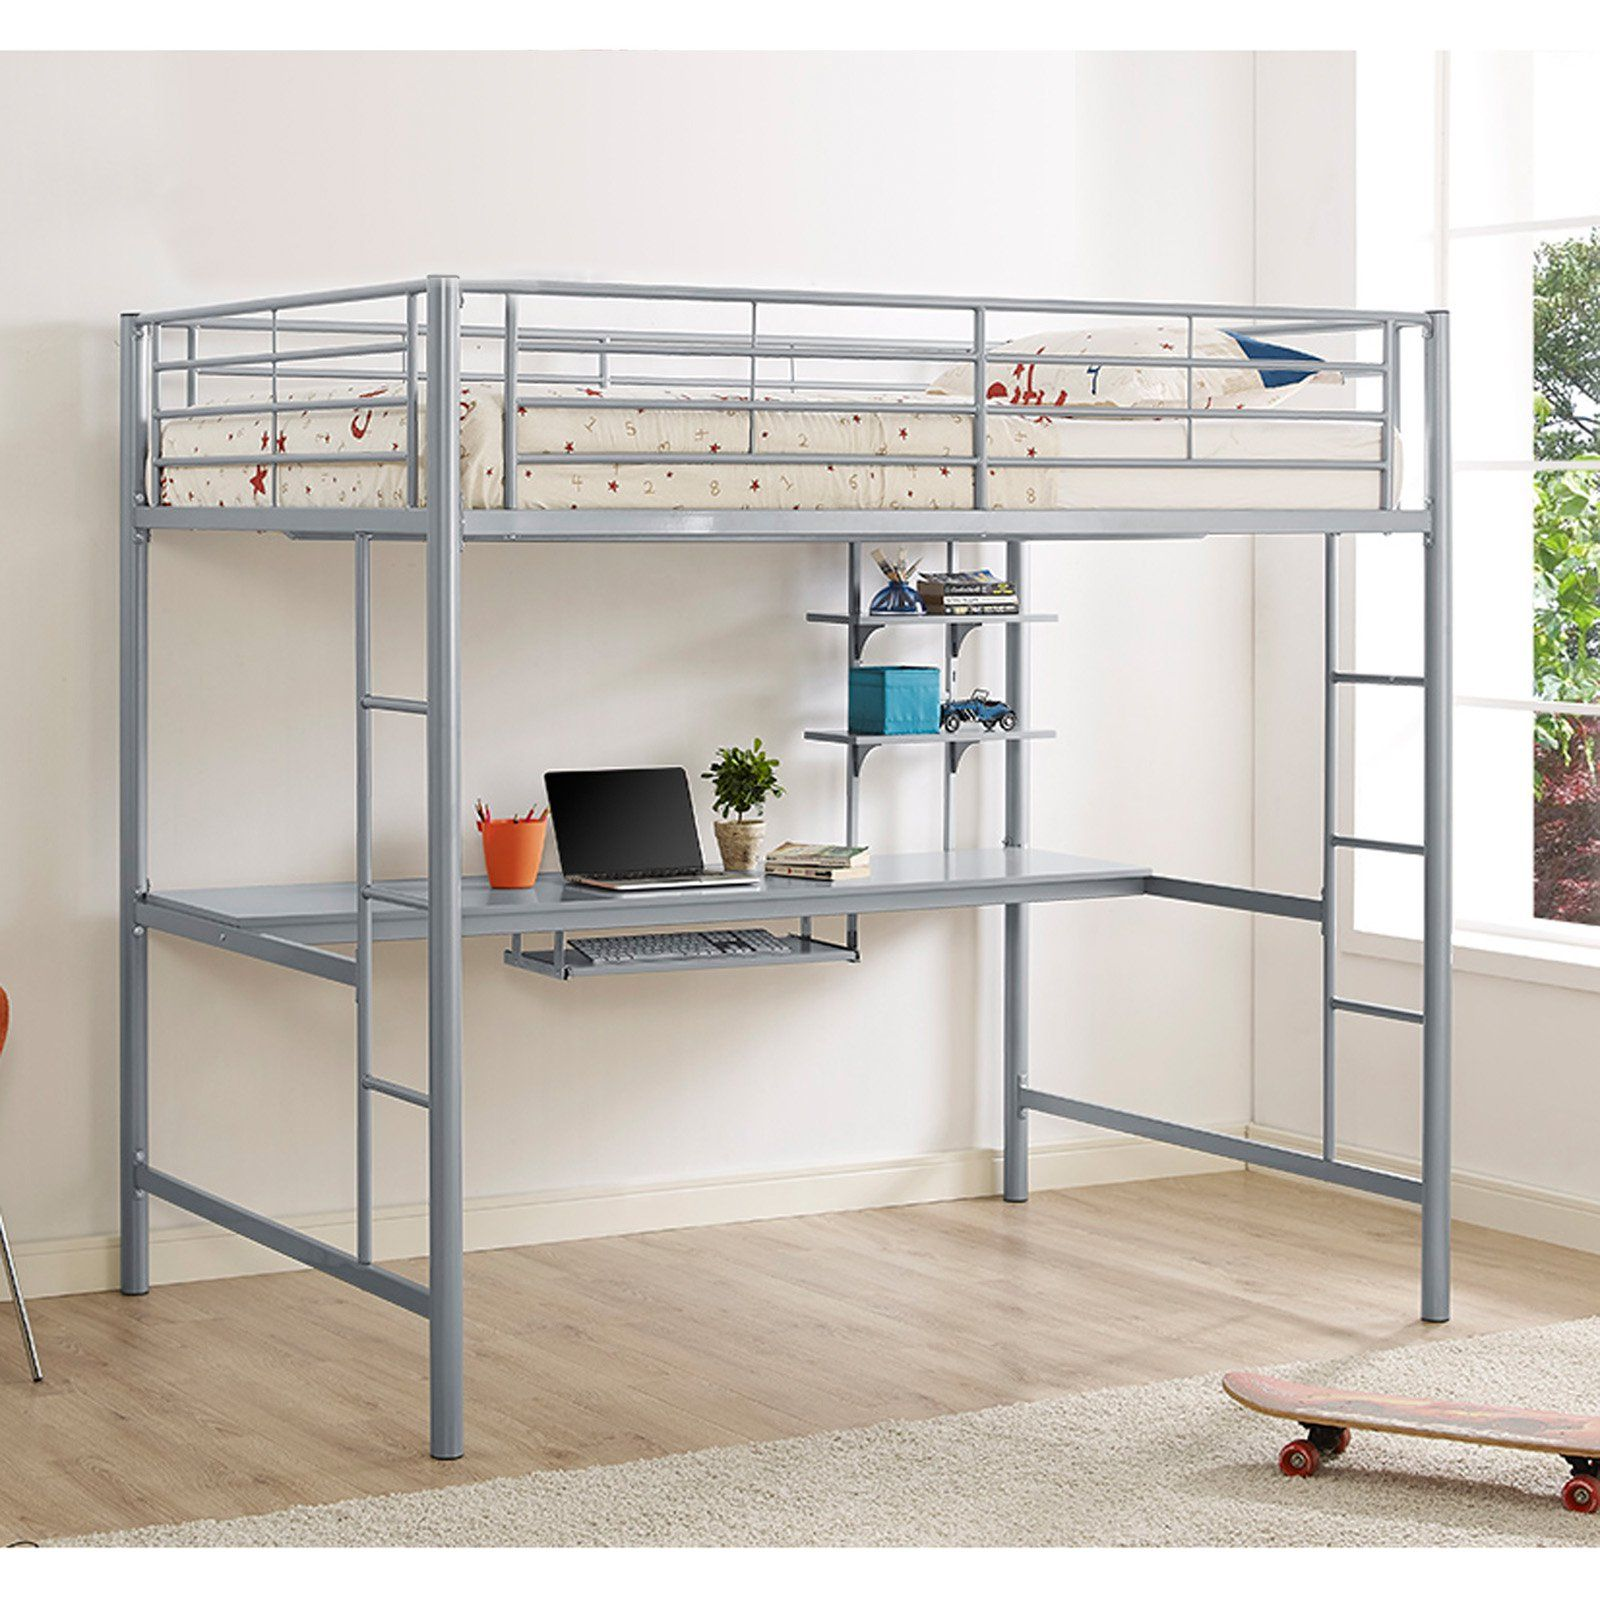 Walker Edison Premium Metal Full Size Loft Bed with Wood ...